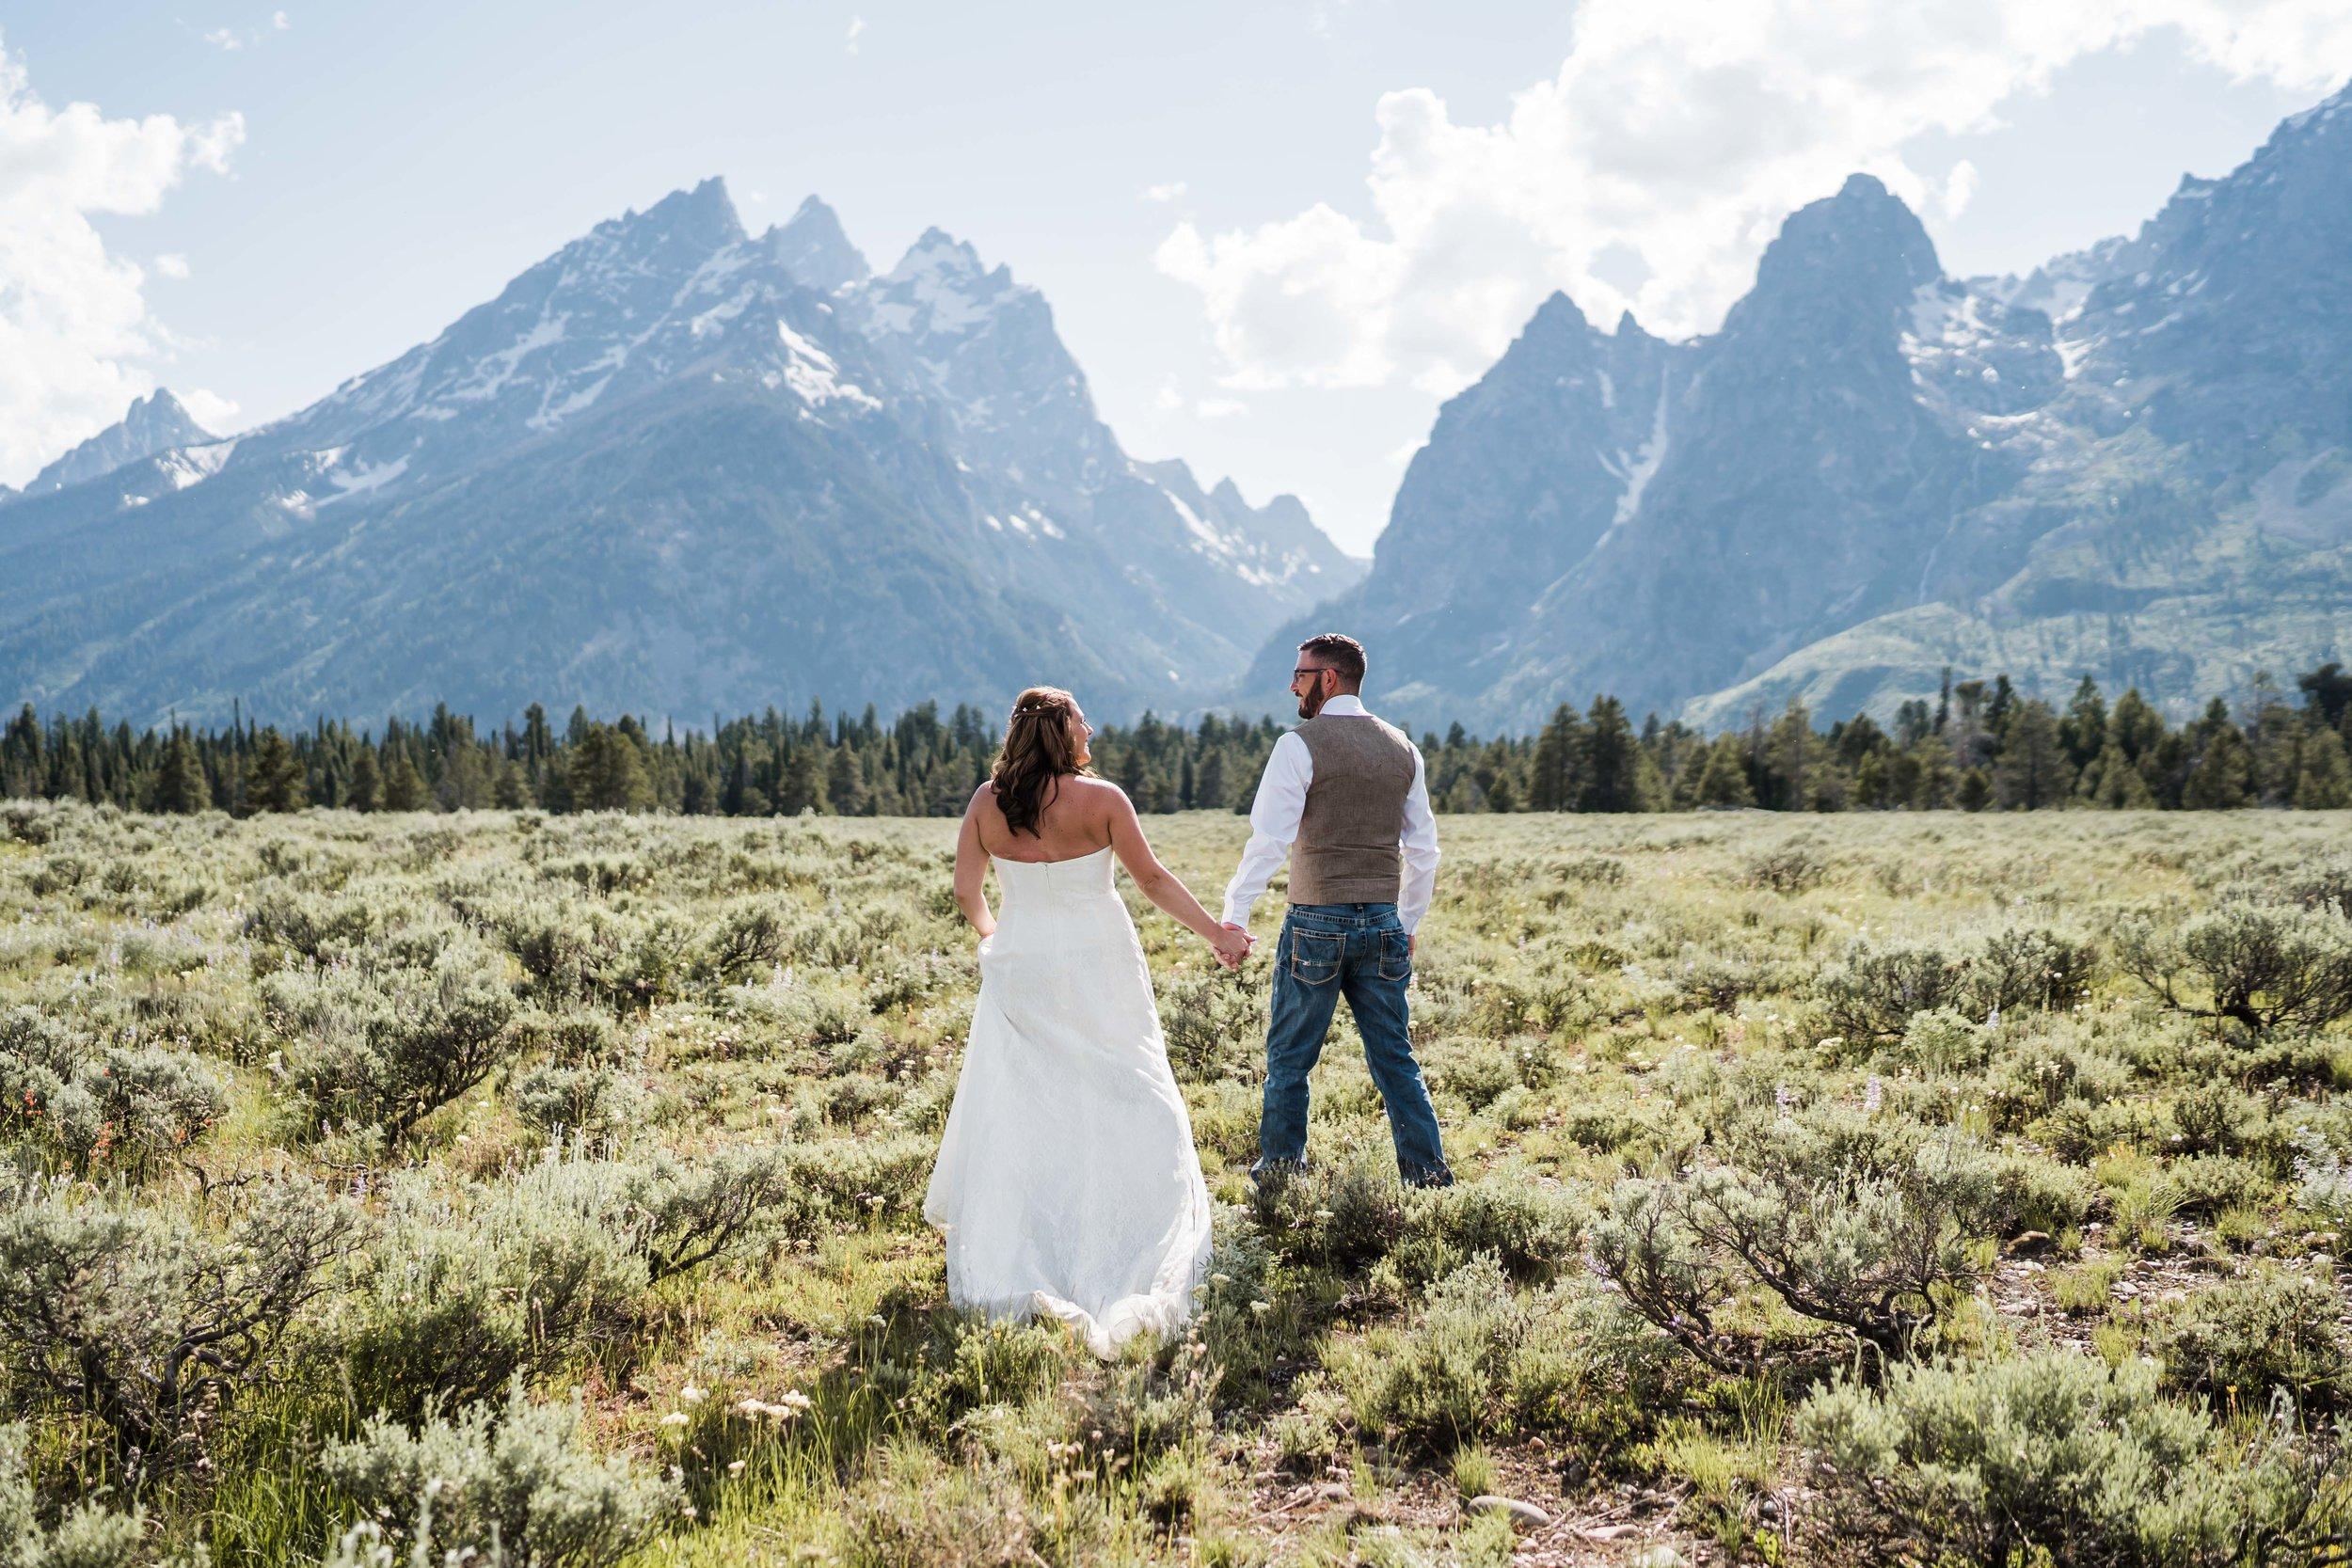 jackson hole adventure wedding photography at schwabachers landing in GTNP -DSD01148.jpg